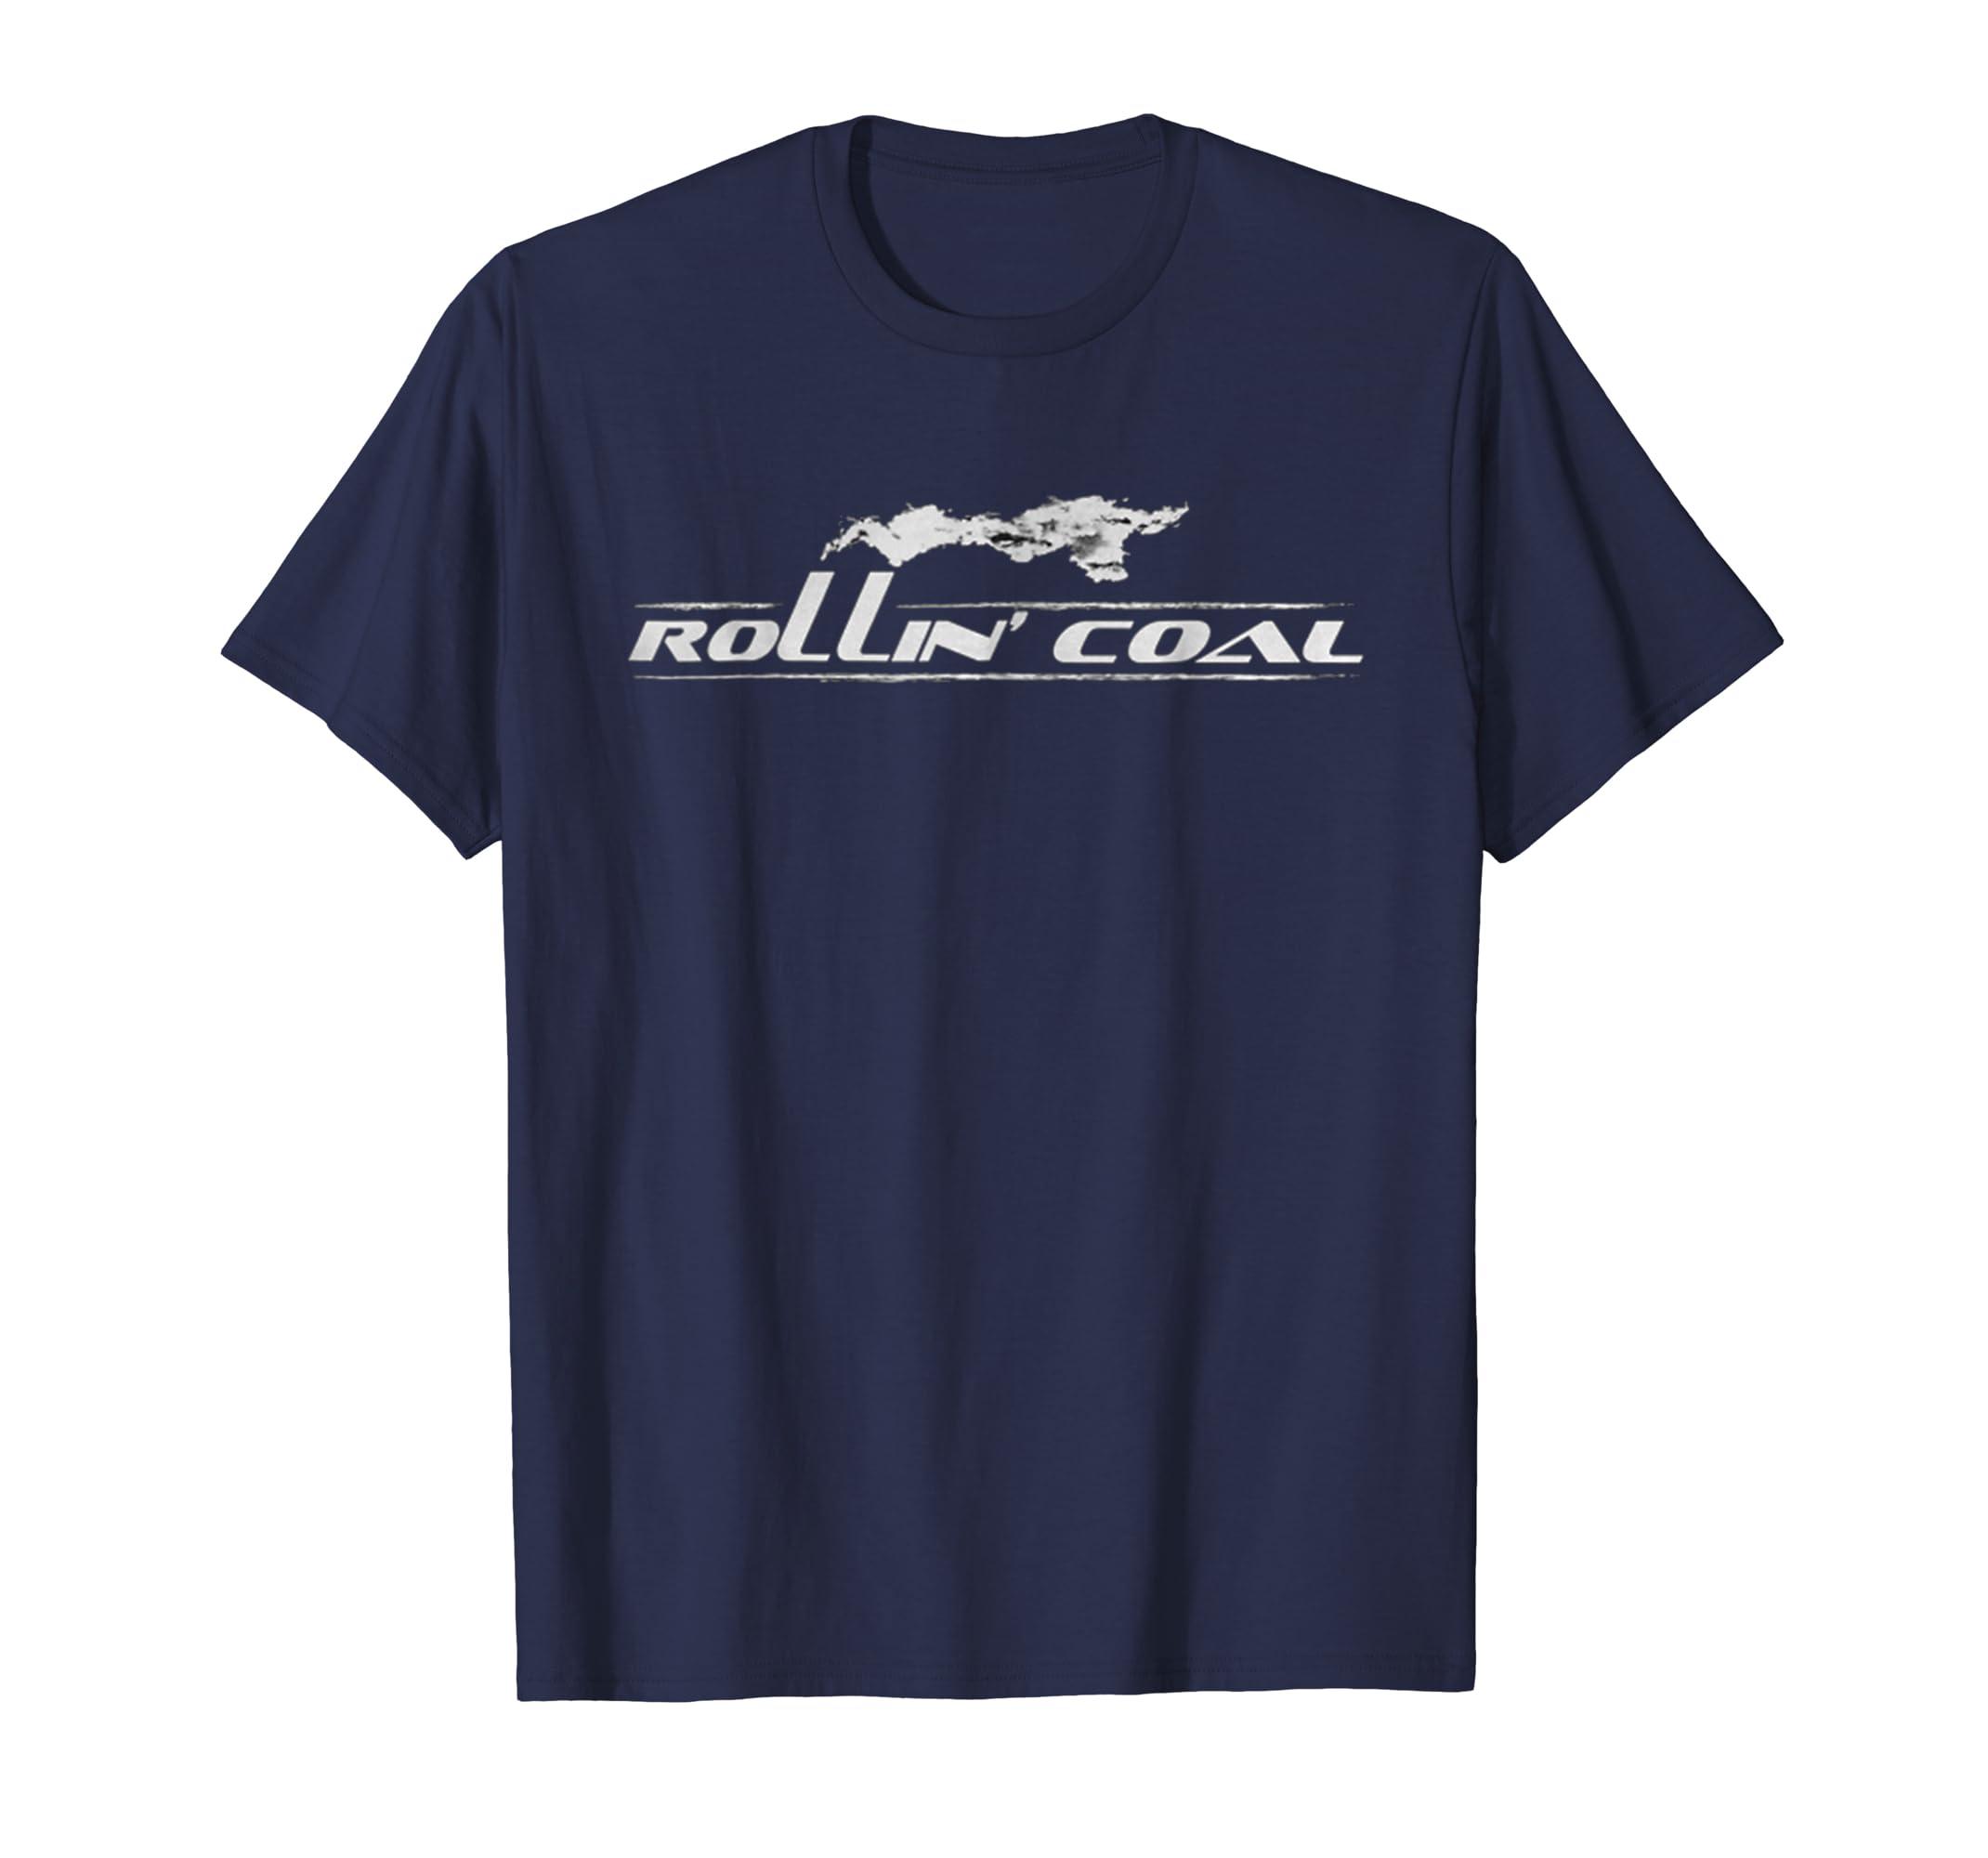 Diesel Shirt Rollin' Coal Truck Driver Engine Mechanic Gift-azvn